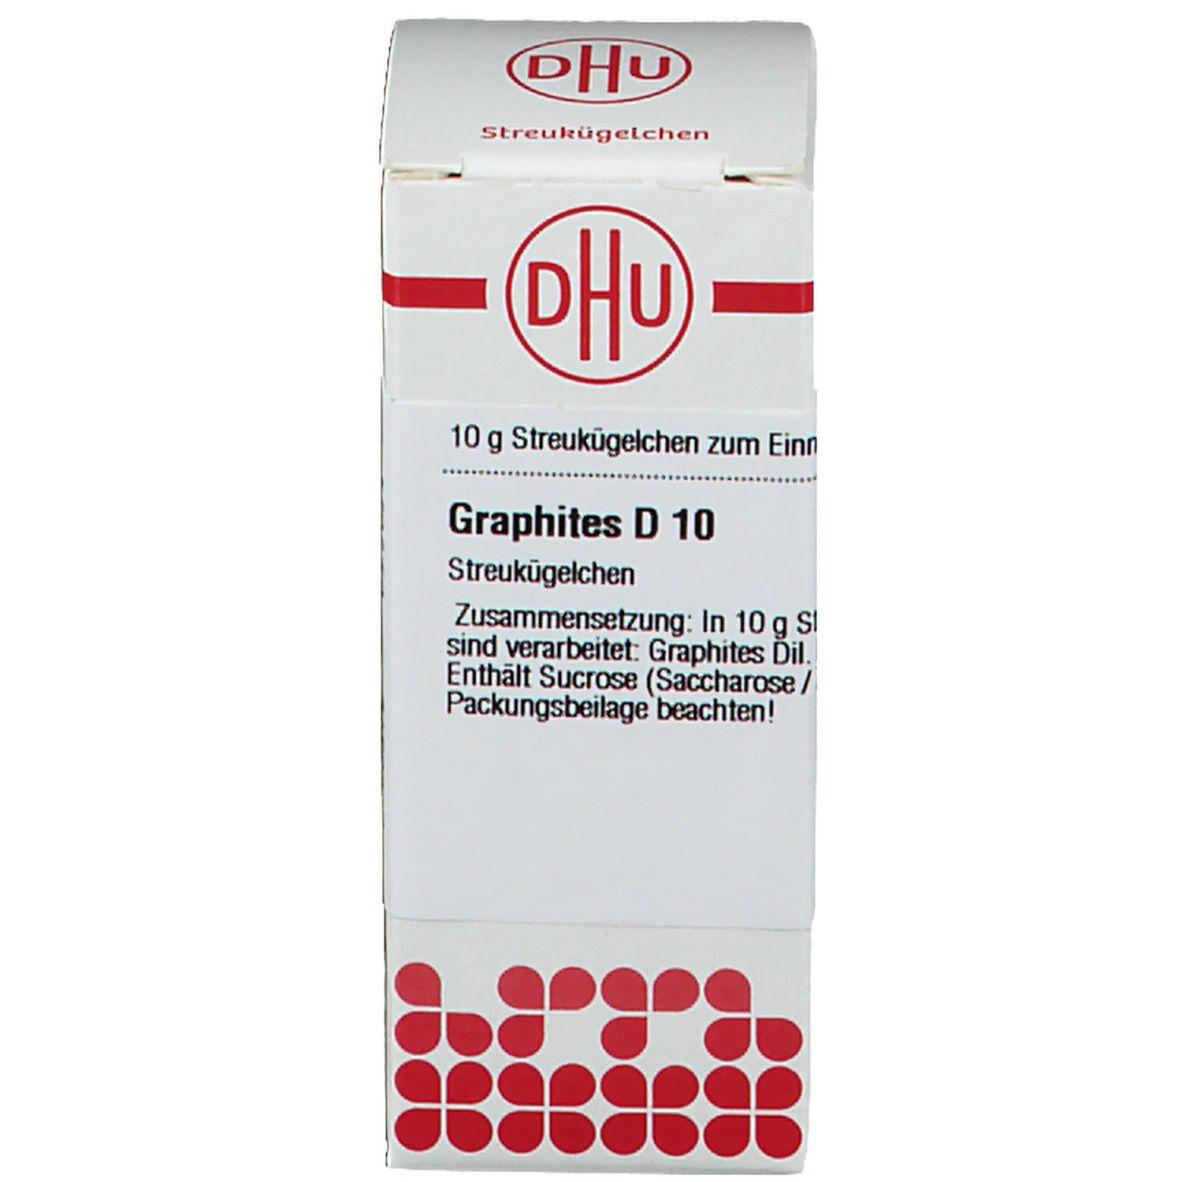 DHU Graphites D10